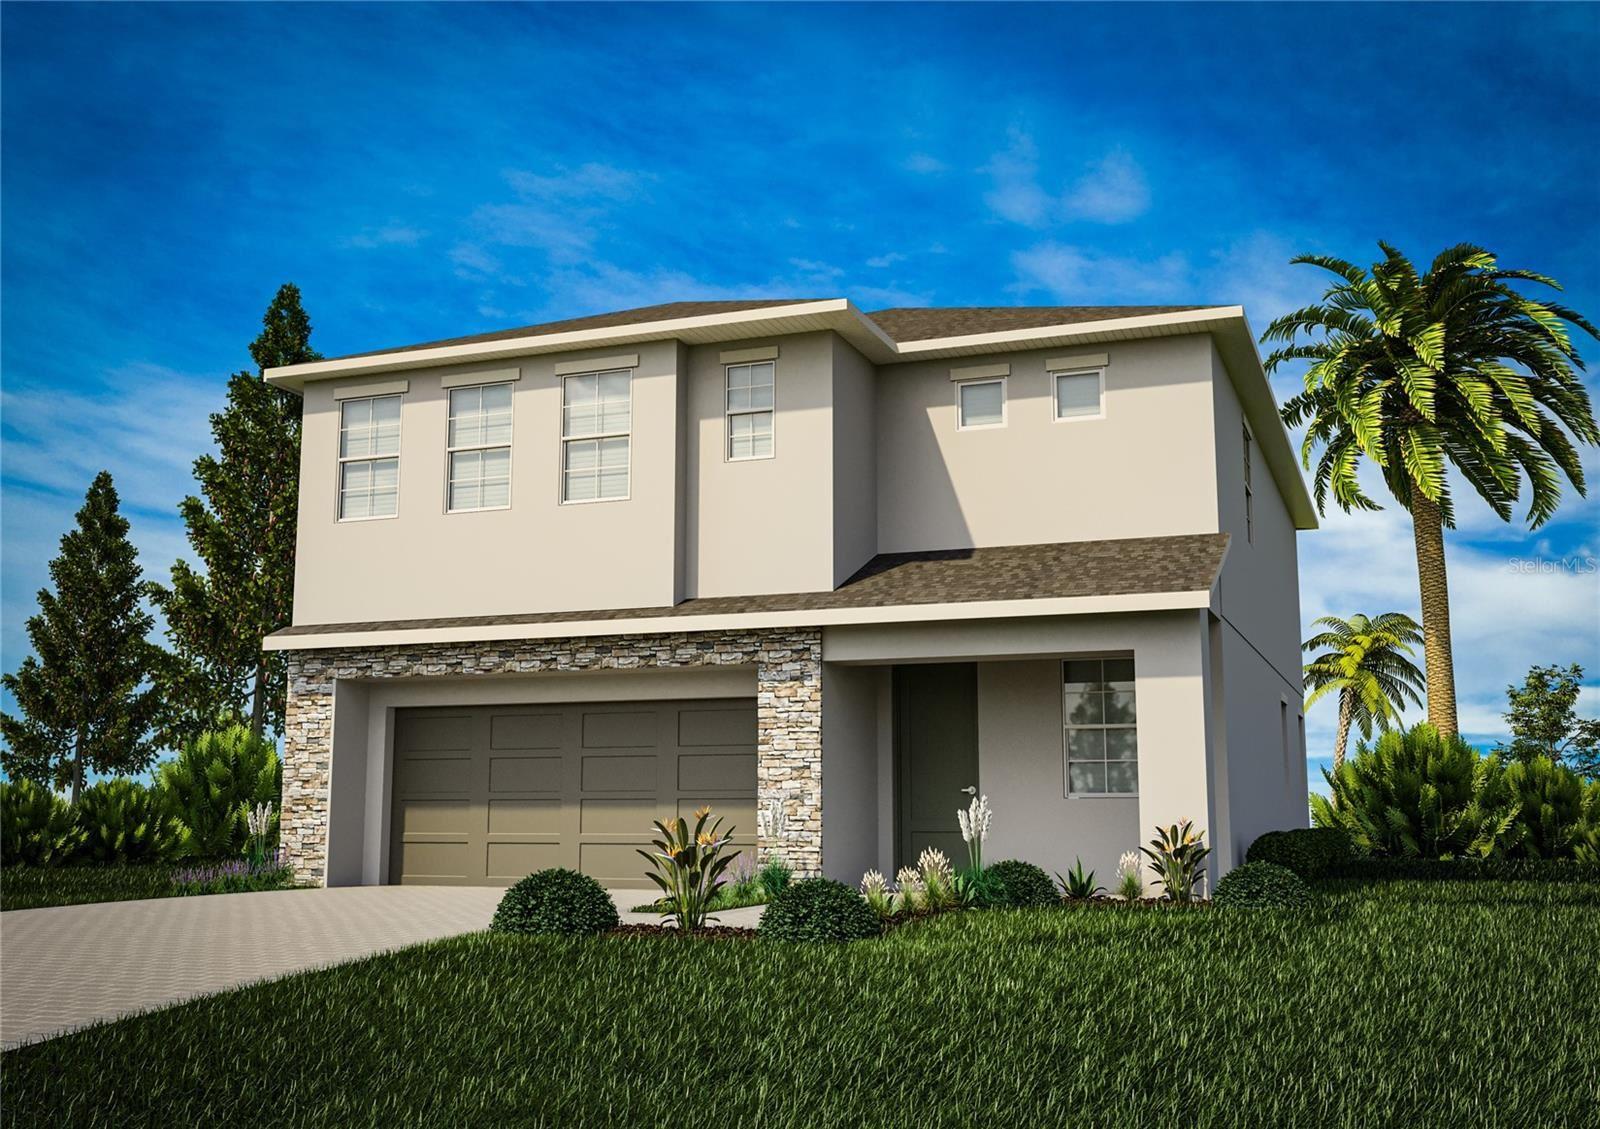 1312 ASH TREE COVE, Casselberry, FL 32707 - MLS#: S5058118